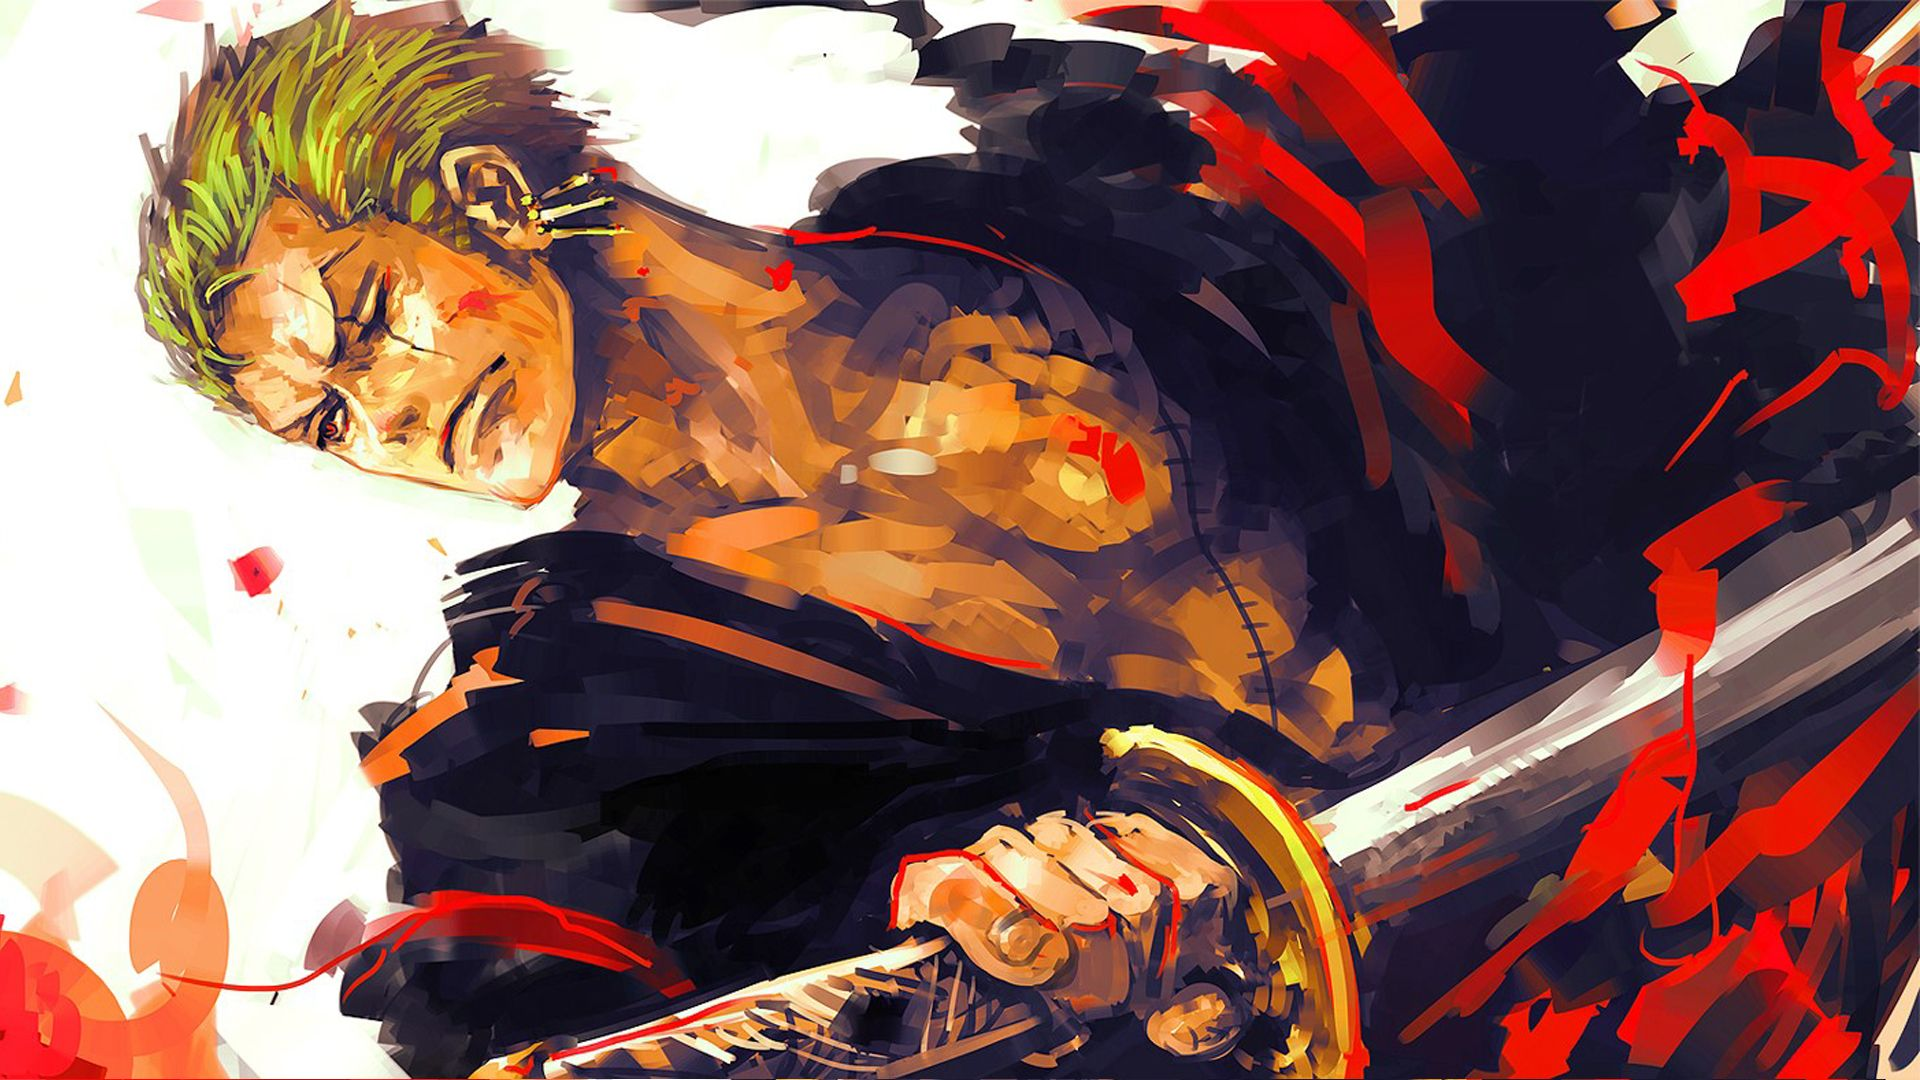 Roronoa Zoro Holdin Katana Anime One Piece Wallpaper Hd